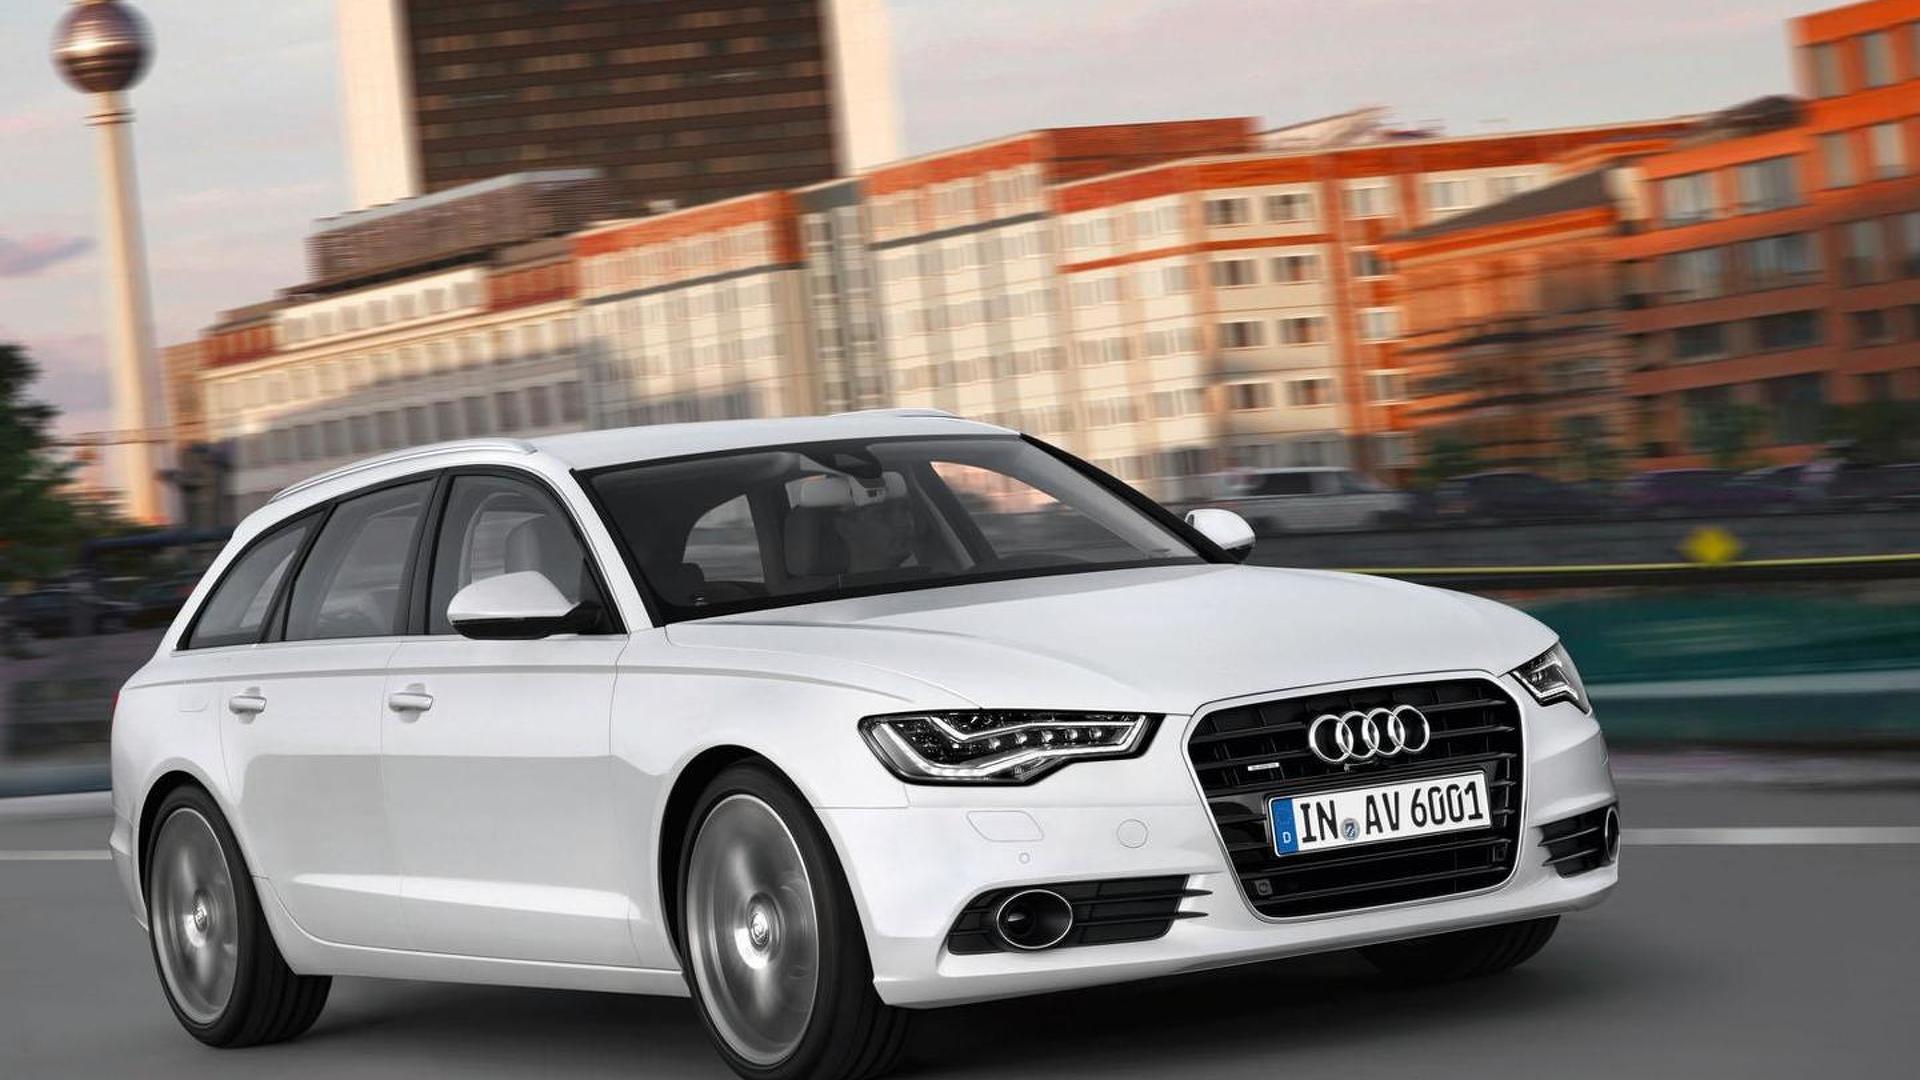 U.S. won't get 2012 Audi A6 Avant